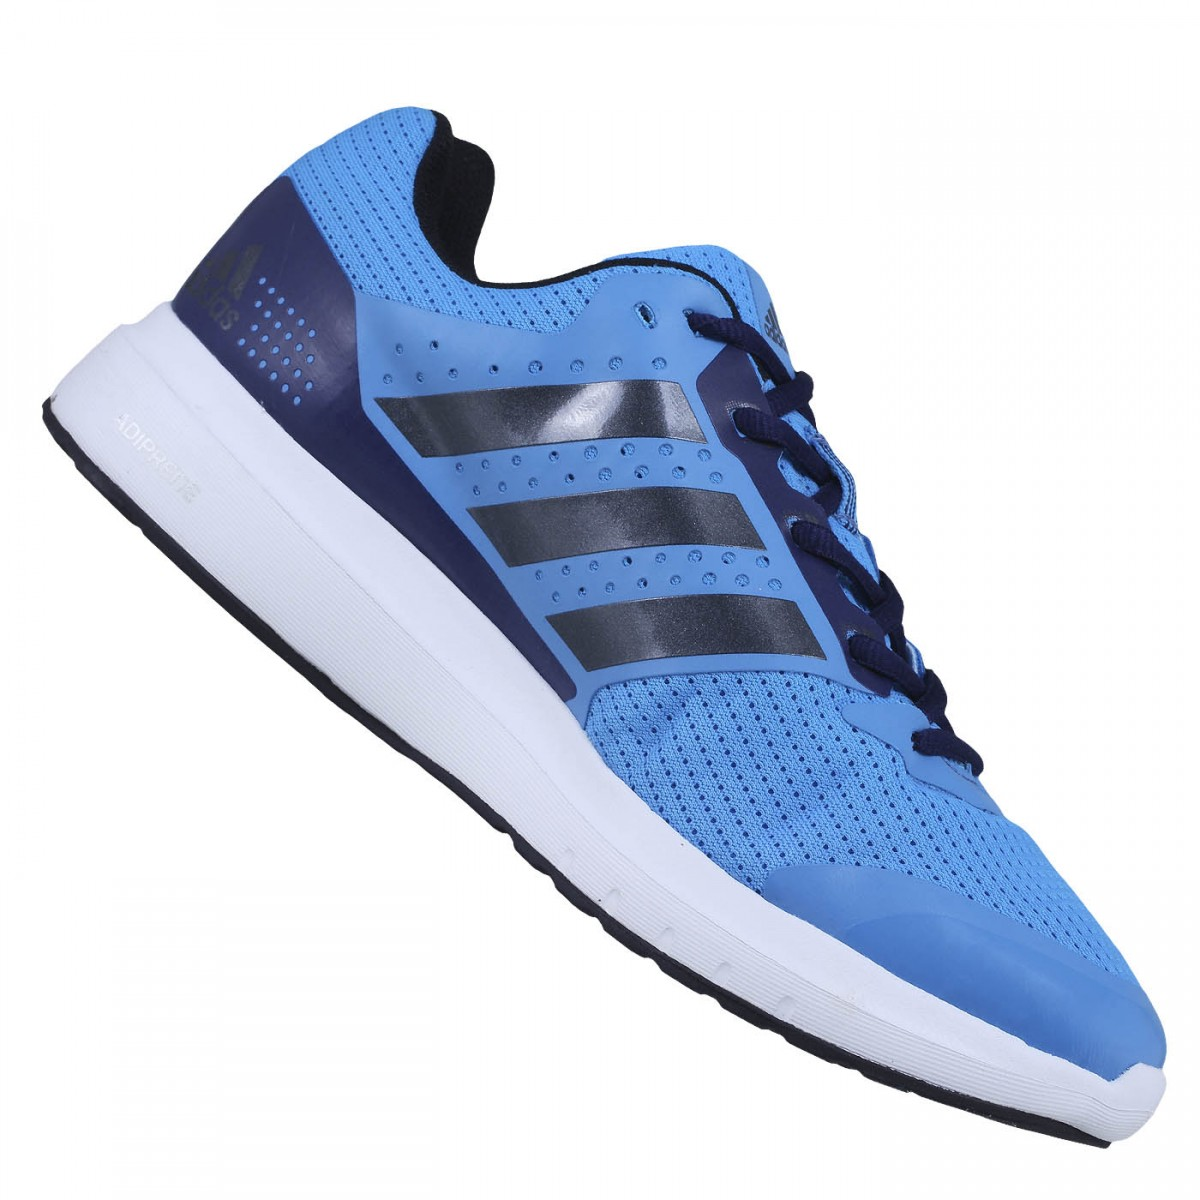 a4edab9bd3b Tênis Adidas Duramo 7 - Masculino